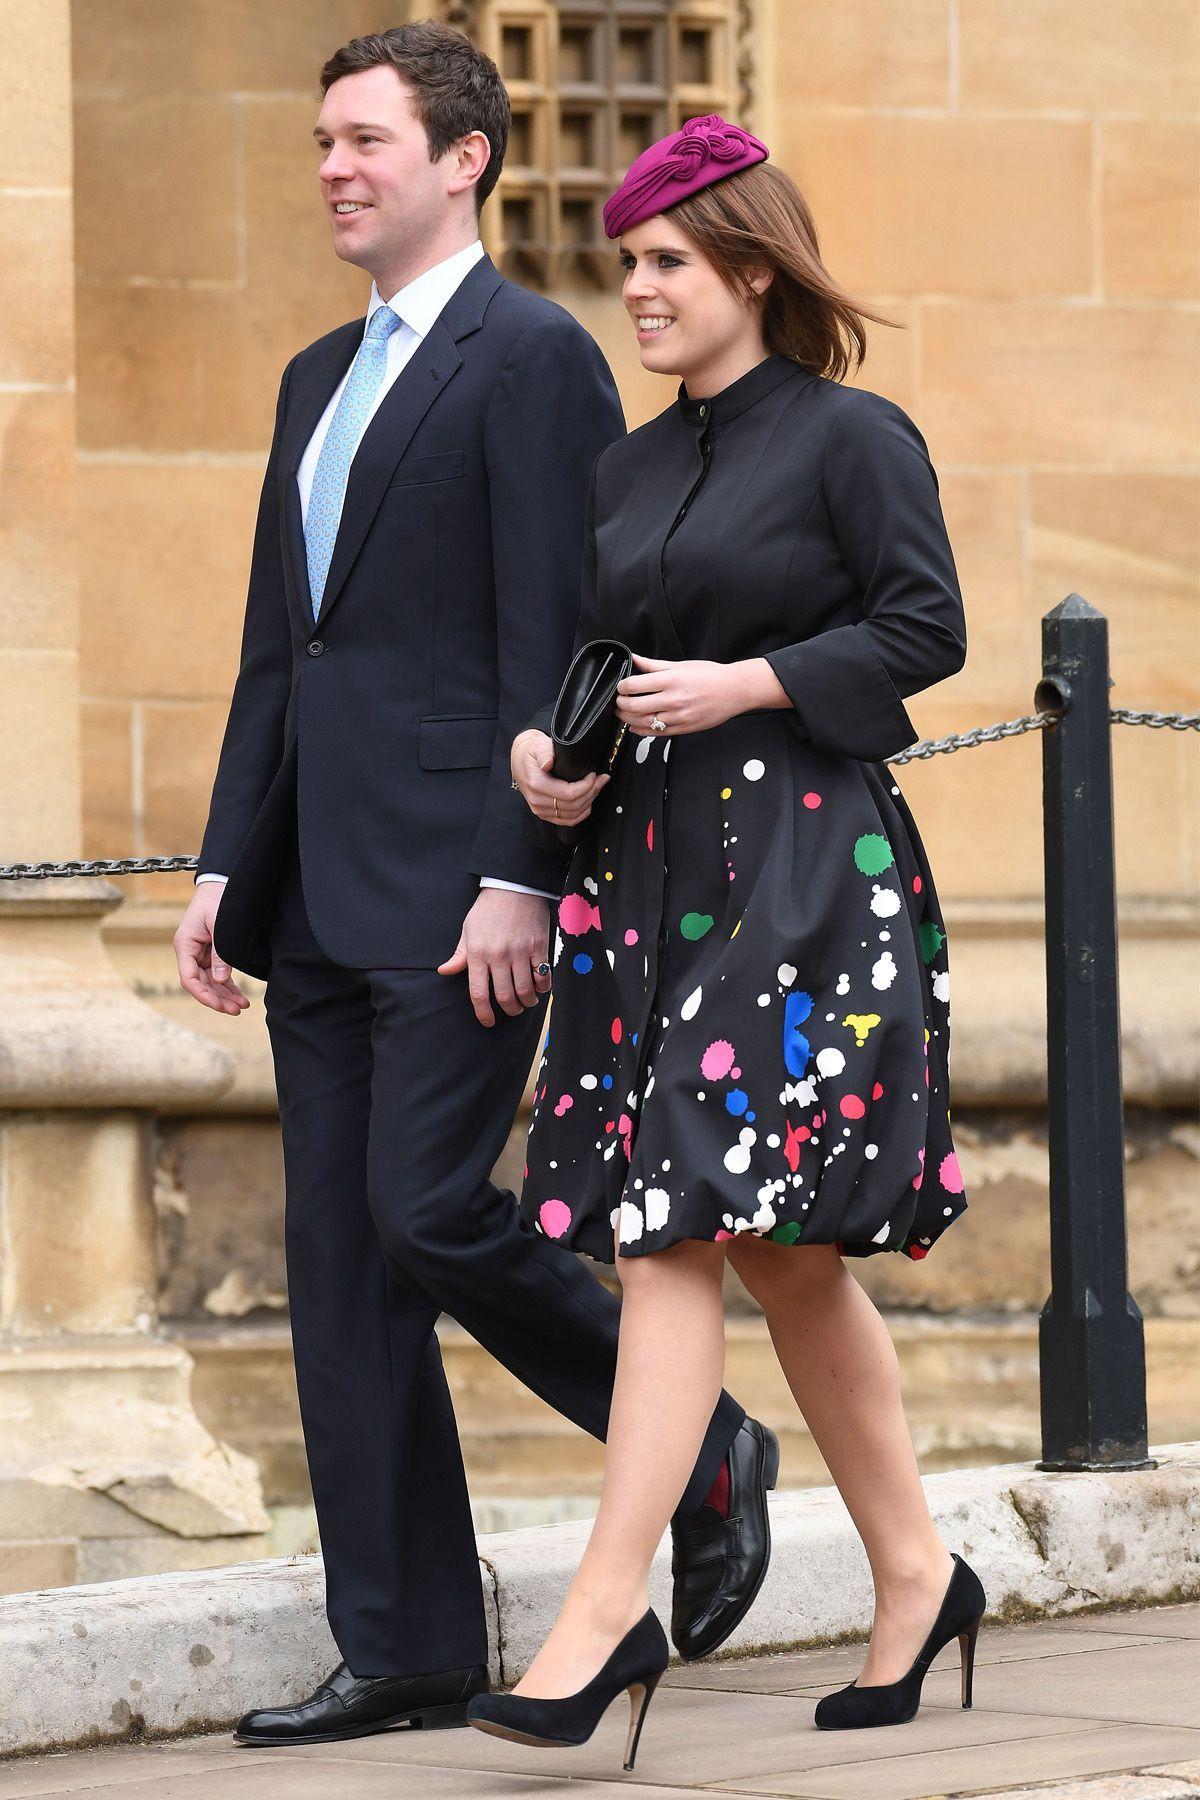 f5c226b7 Easter Spectaclegoodhousemag Princesa Anne, Princesa Beatrice, Princesa  Eugenie, Prince Andrew, Prince Philip